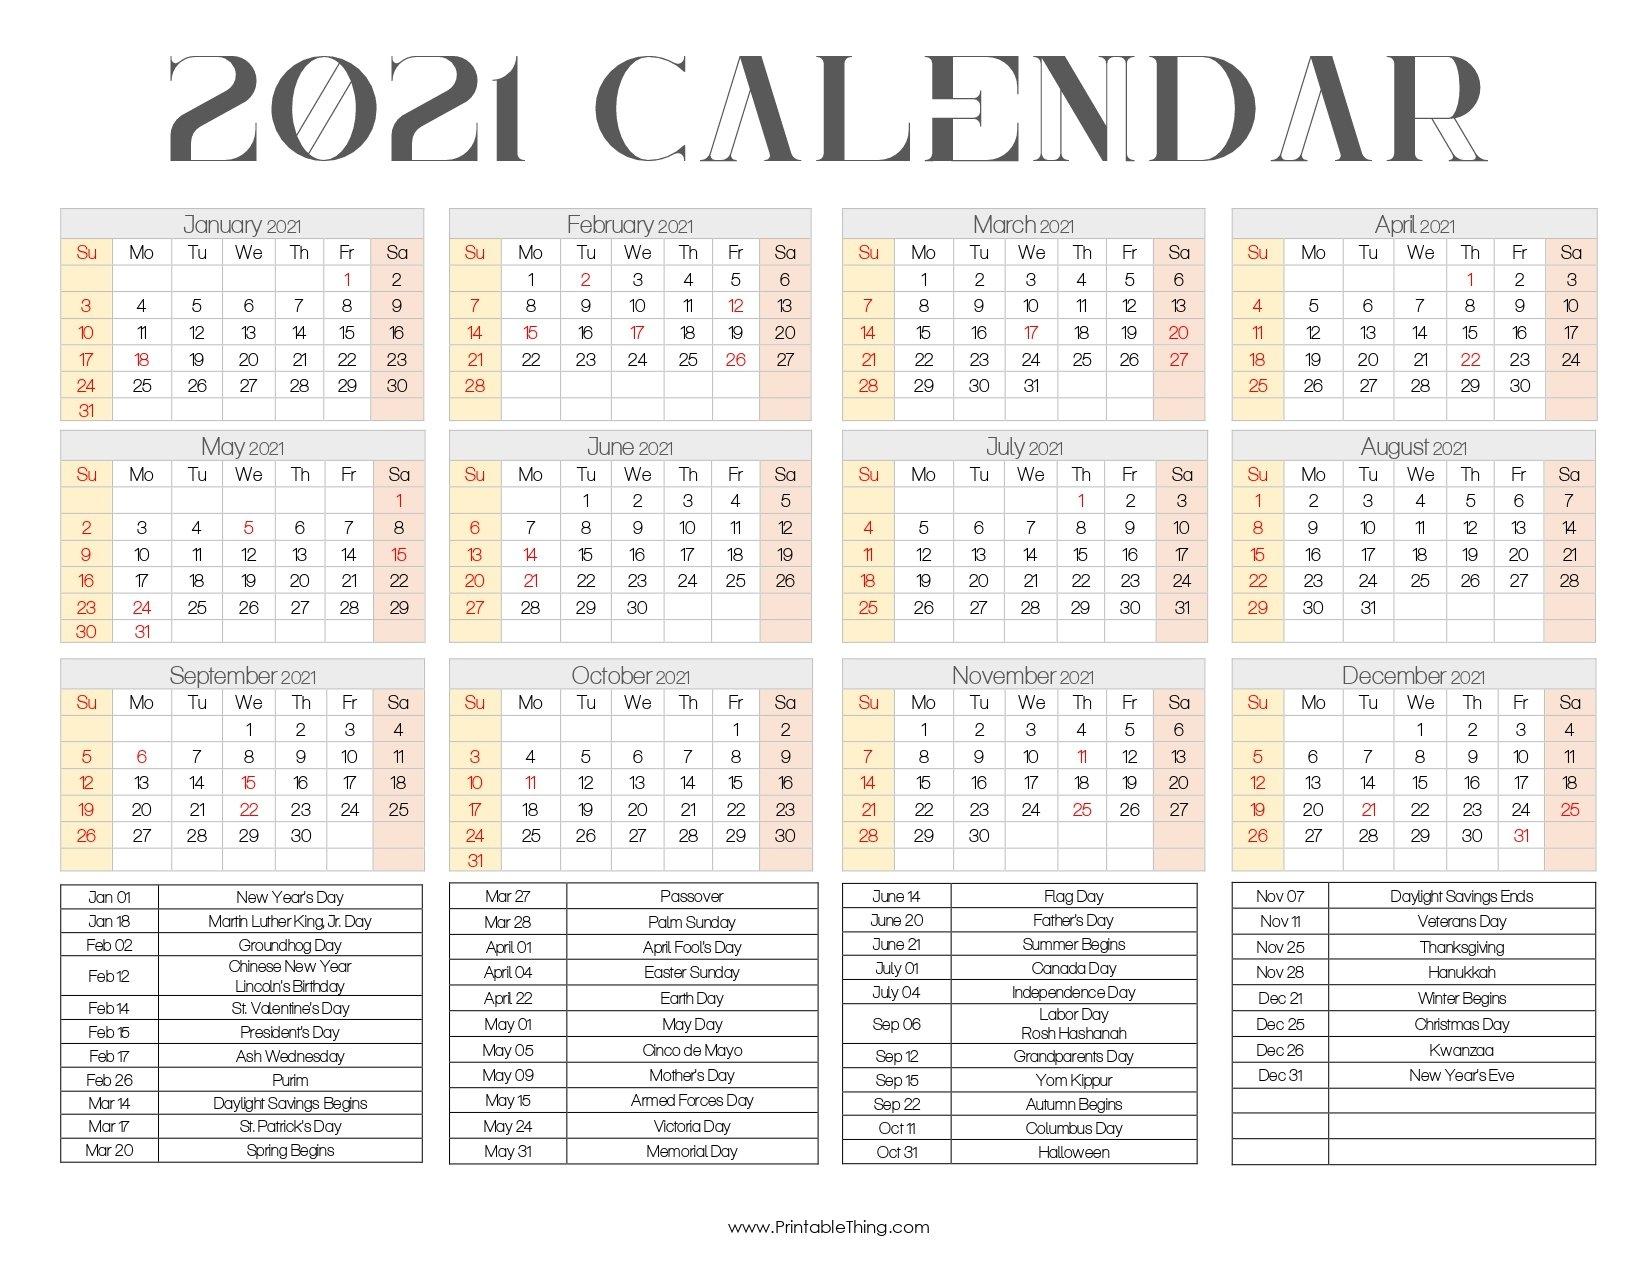 2021 Calendar Printable One Page, 2021 Calendar Printable Pdf with regard to One Page Photo Calendar 2021 Image